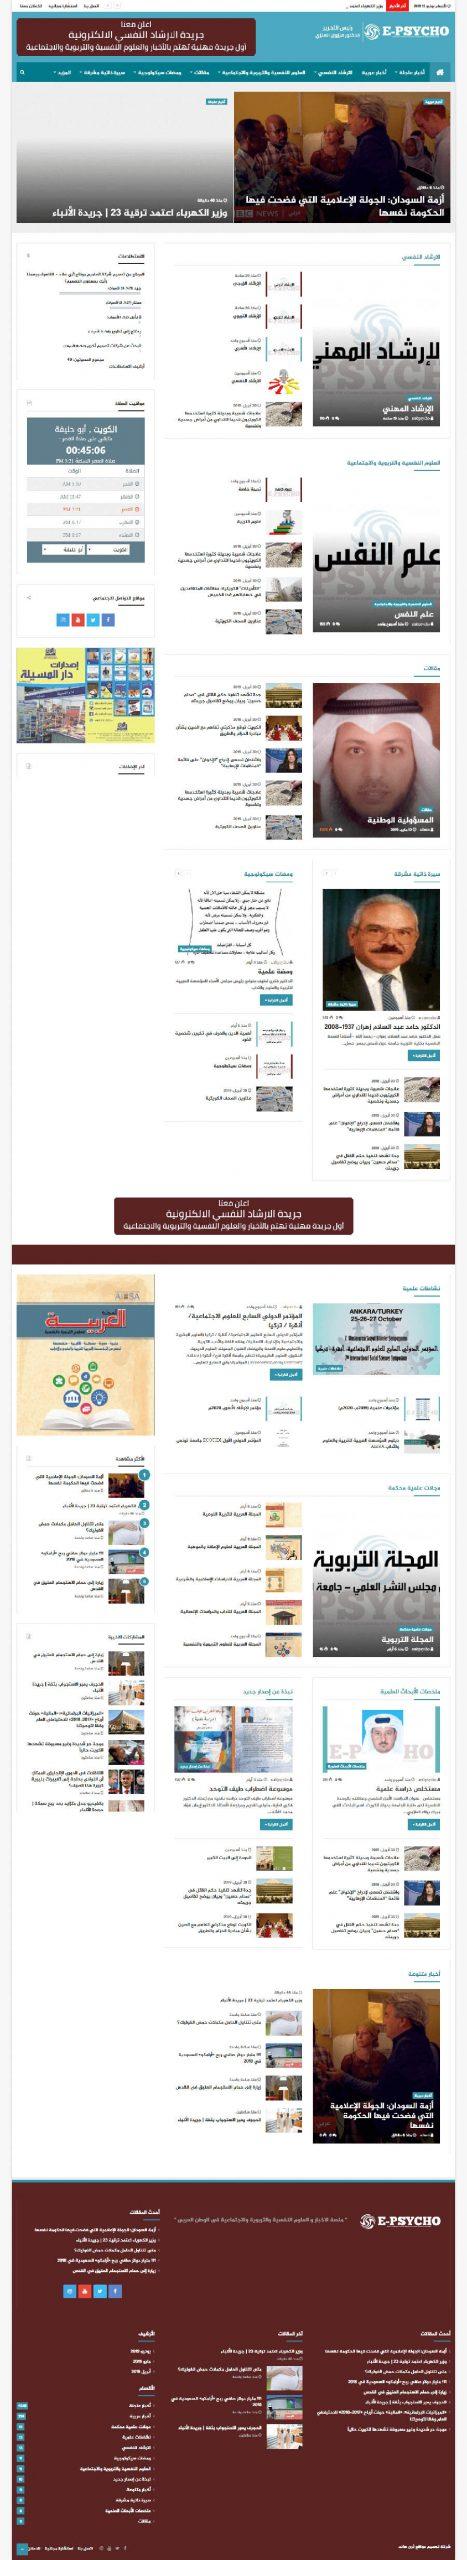 موقع اخباري arab psycho